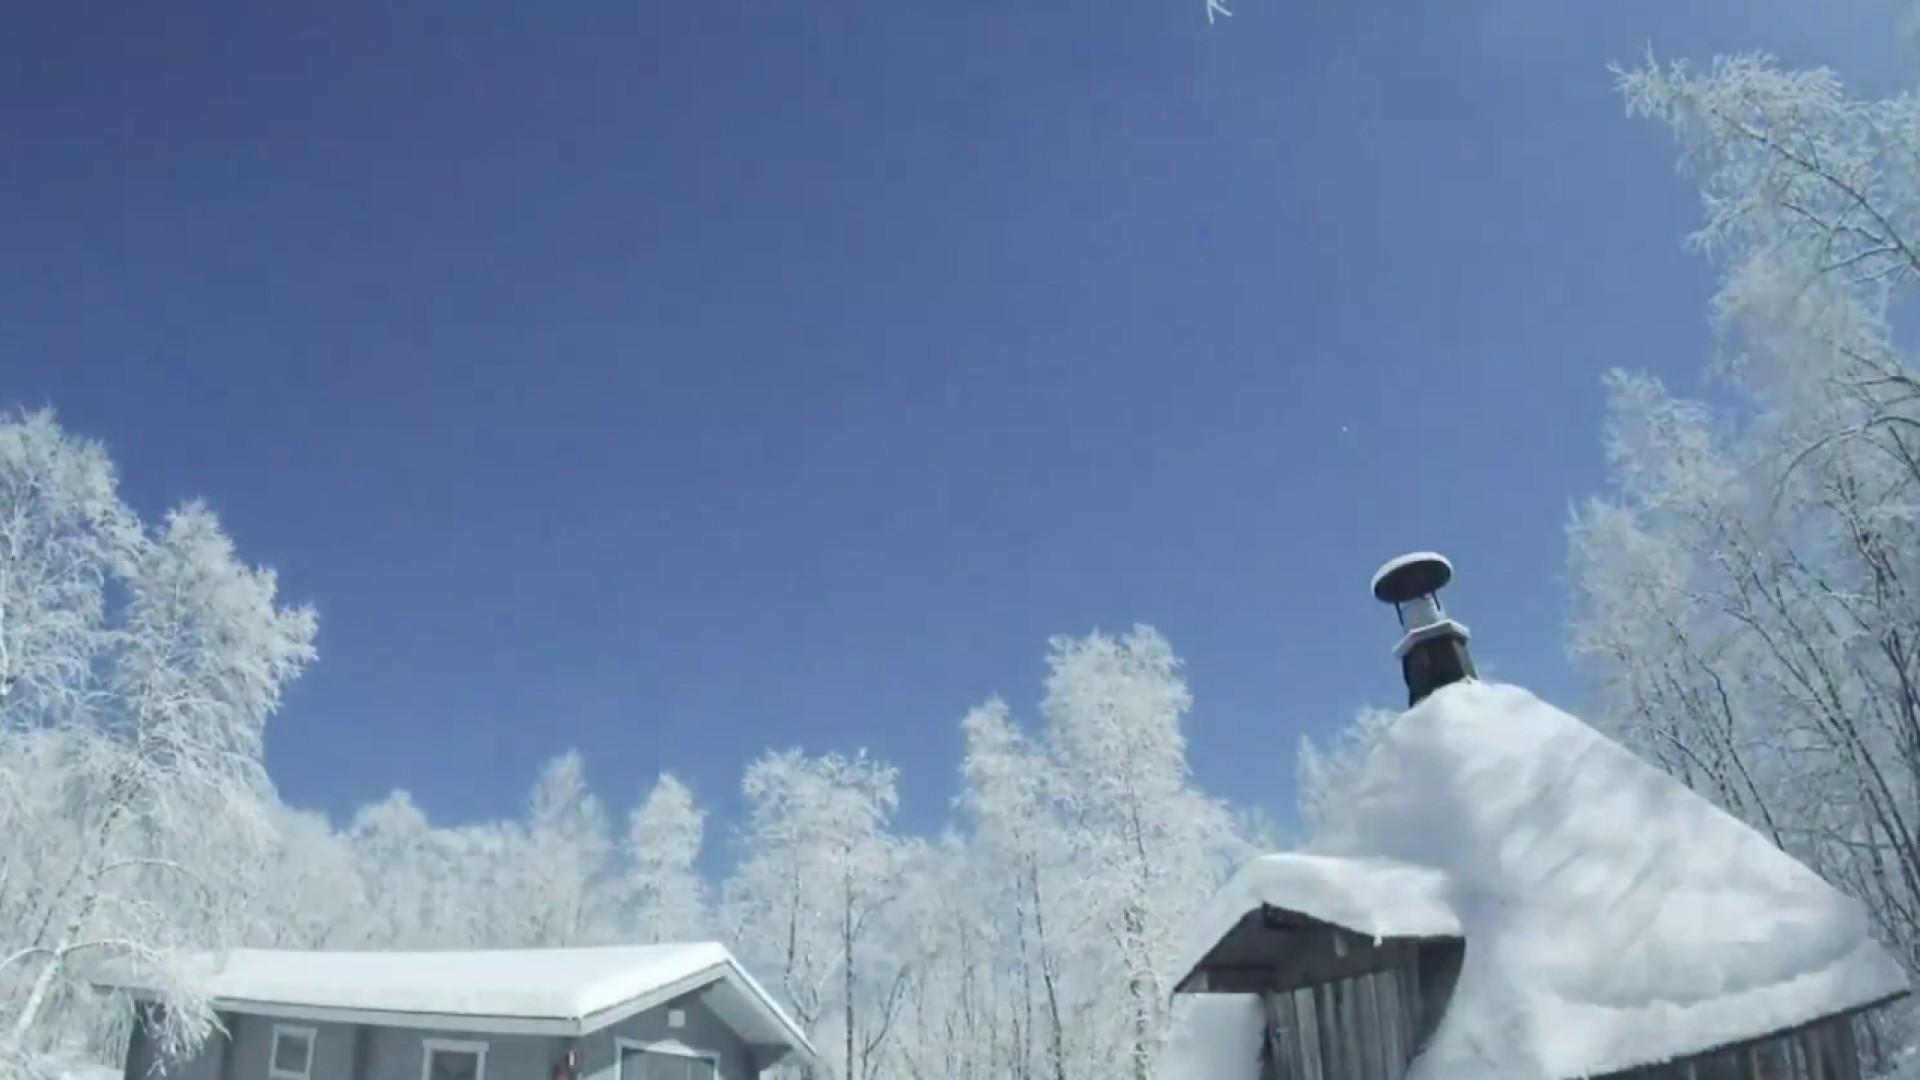 Meteorito ilumina céus da Finlândia